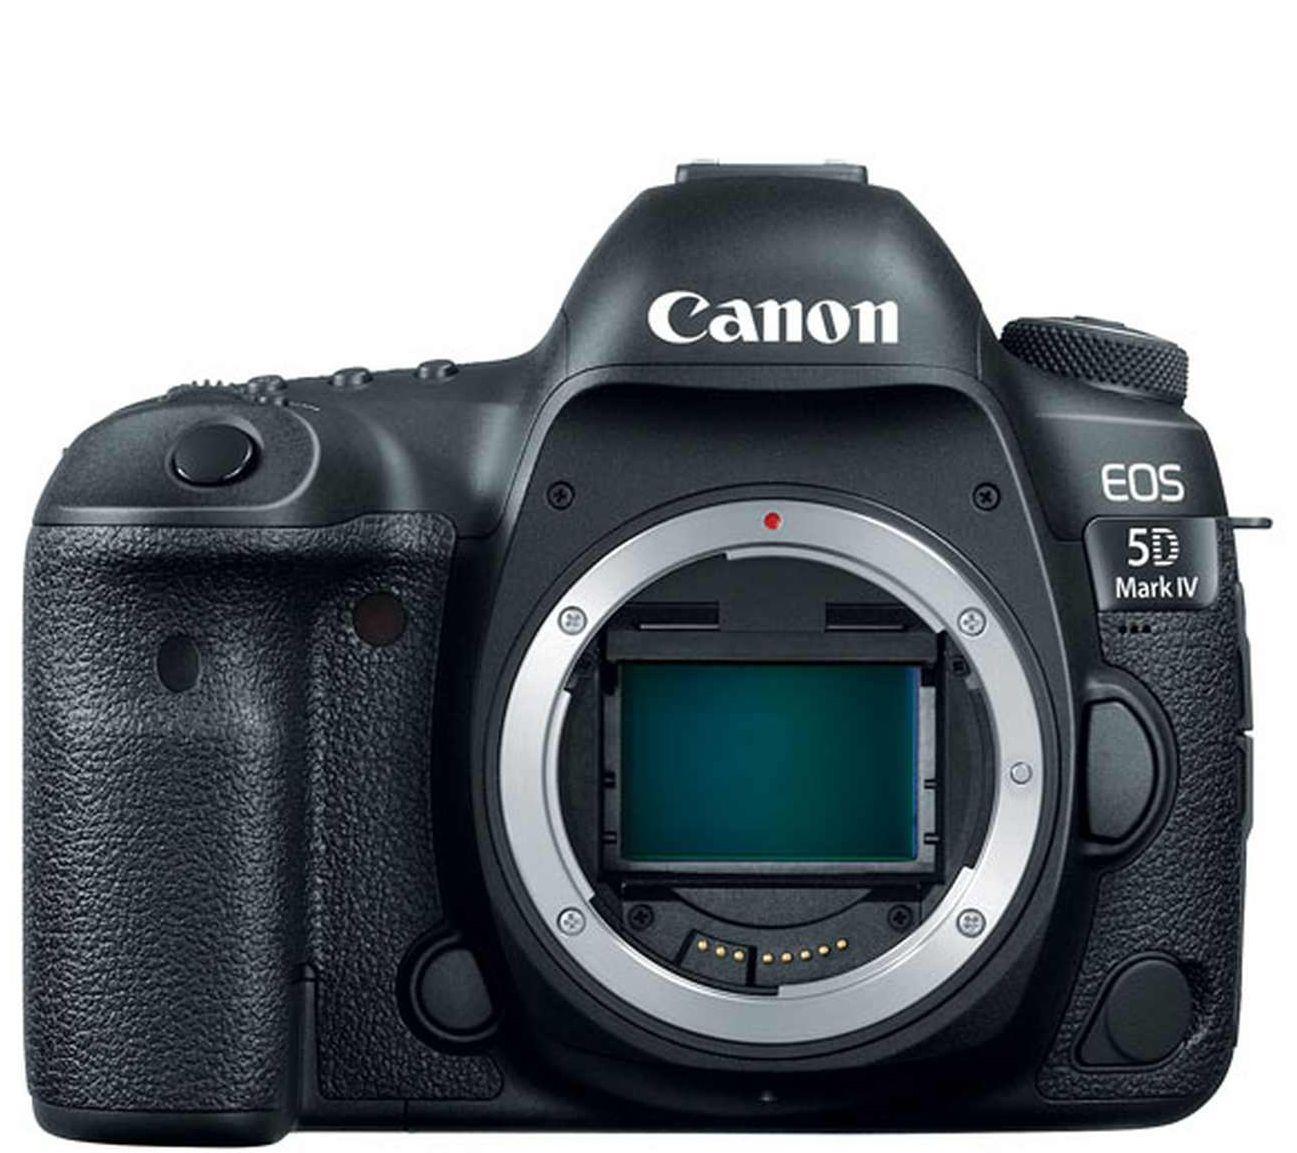 Camera Clearance Dslr Cameras digital cameras camera kits qvc com canon eos 5d mark iv dslr body only lens required e290304